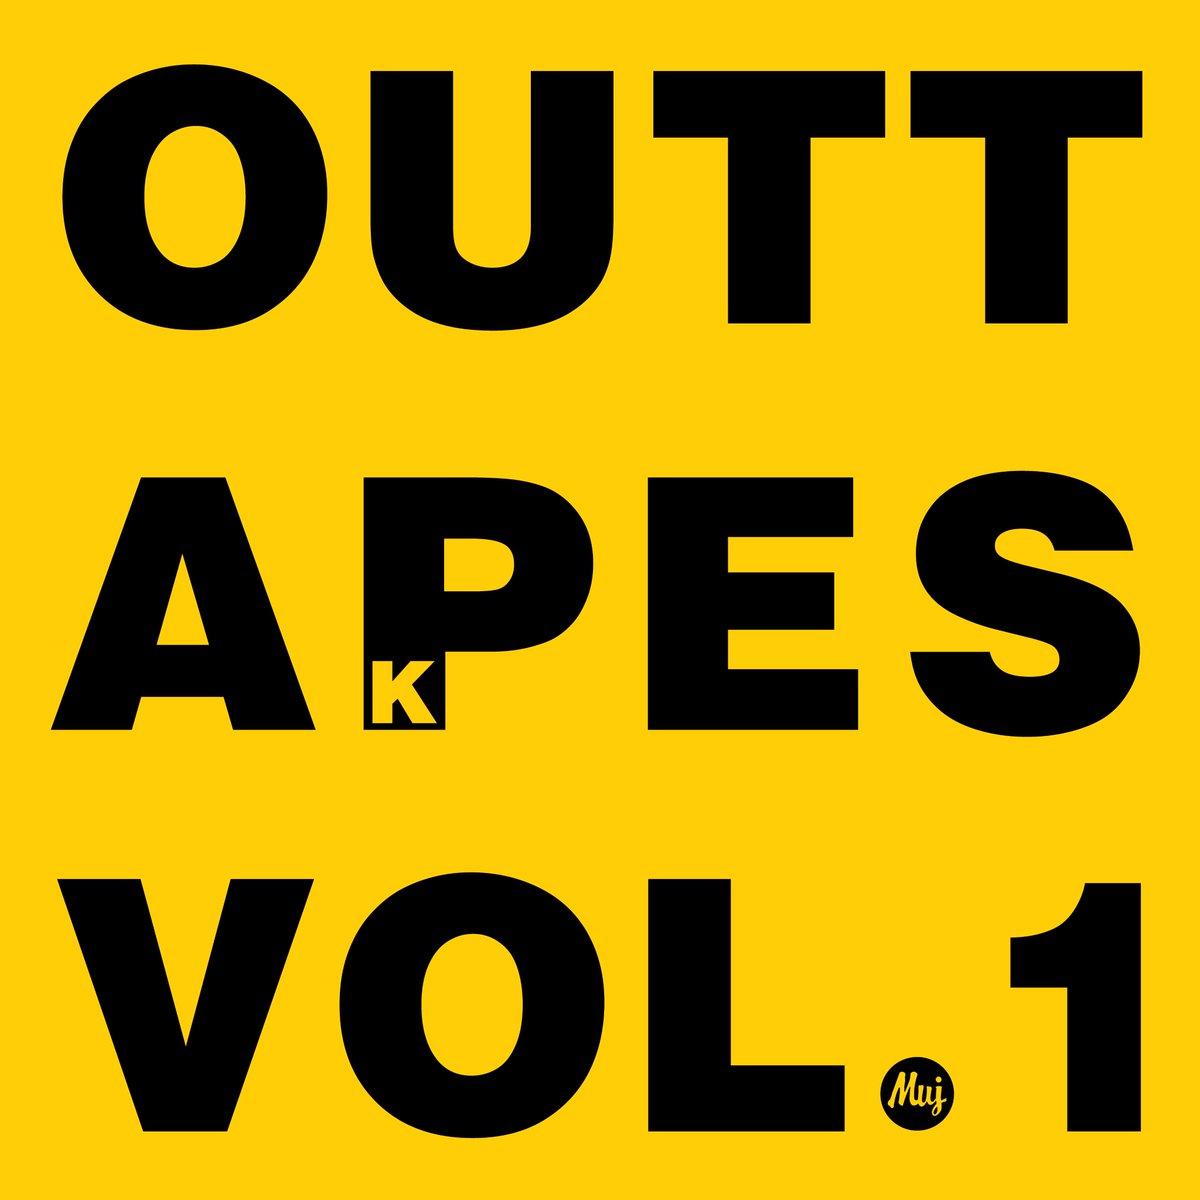 OUT NOW #beattape #muj  https:// mujbeats.bandcamp.com/album/out-tap- k-es &nbsp; … <br>http://pic.twitter.com/C5HEeQvEK2